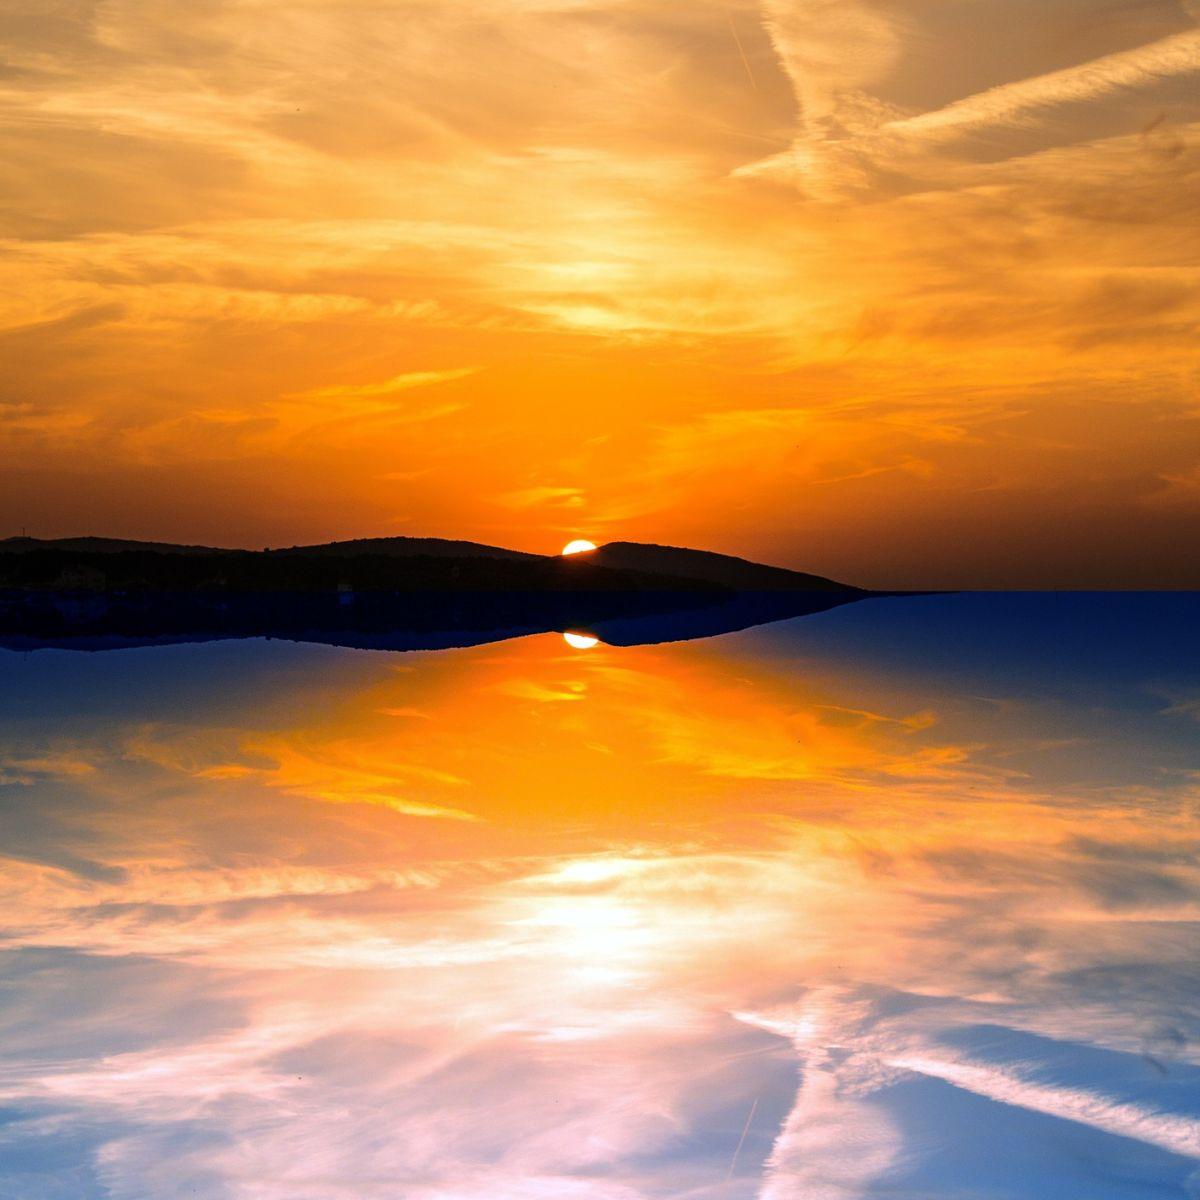 Evening reflections on sunset on lake